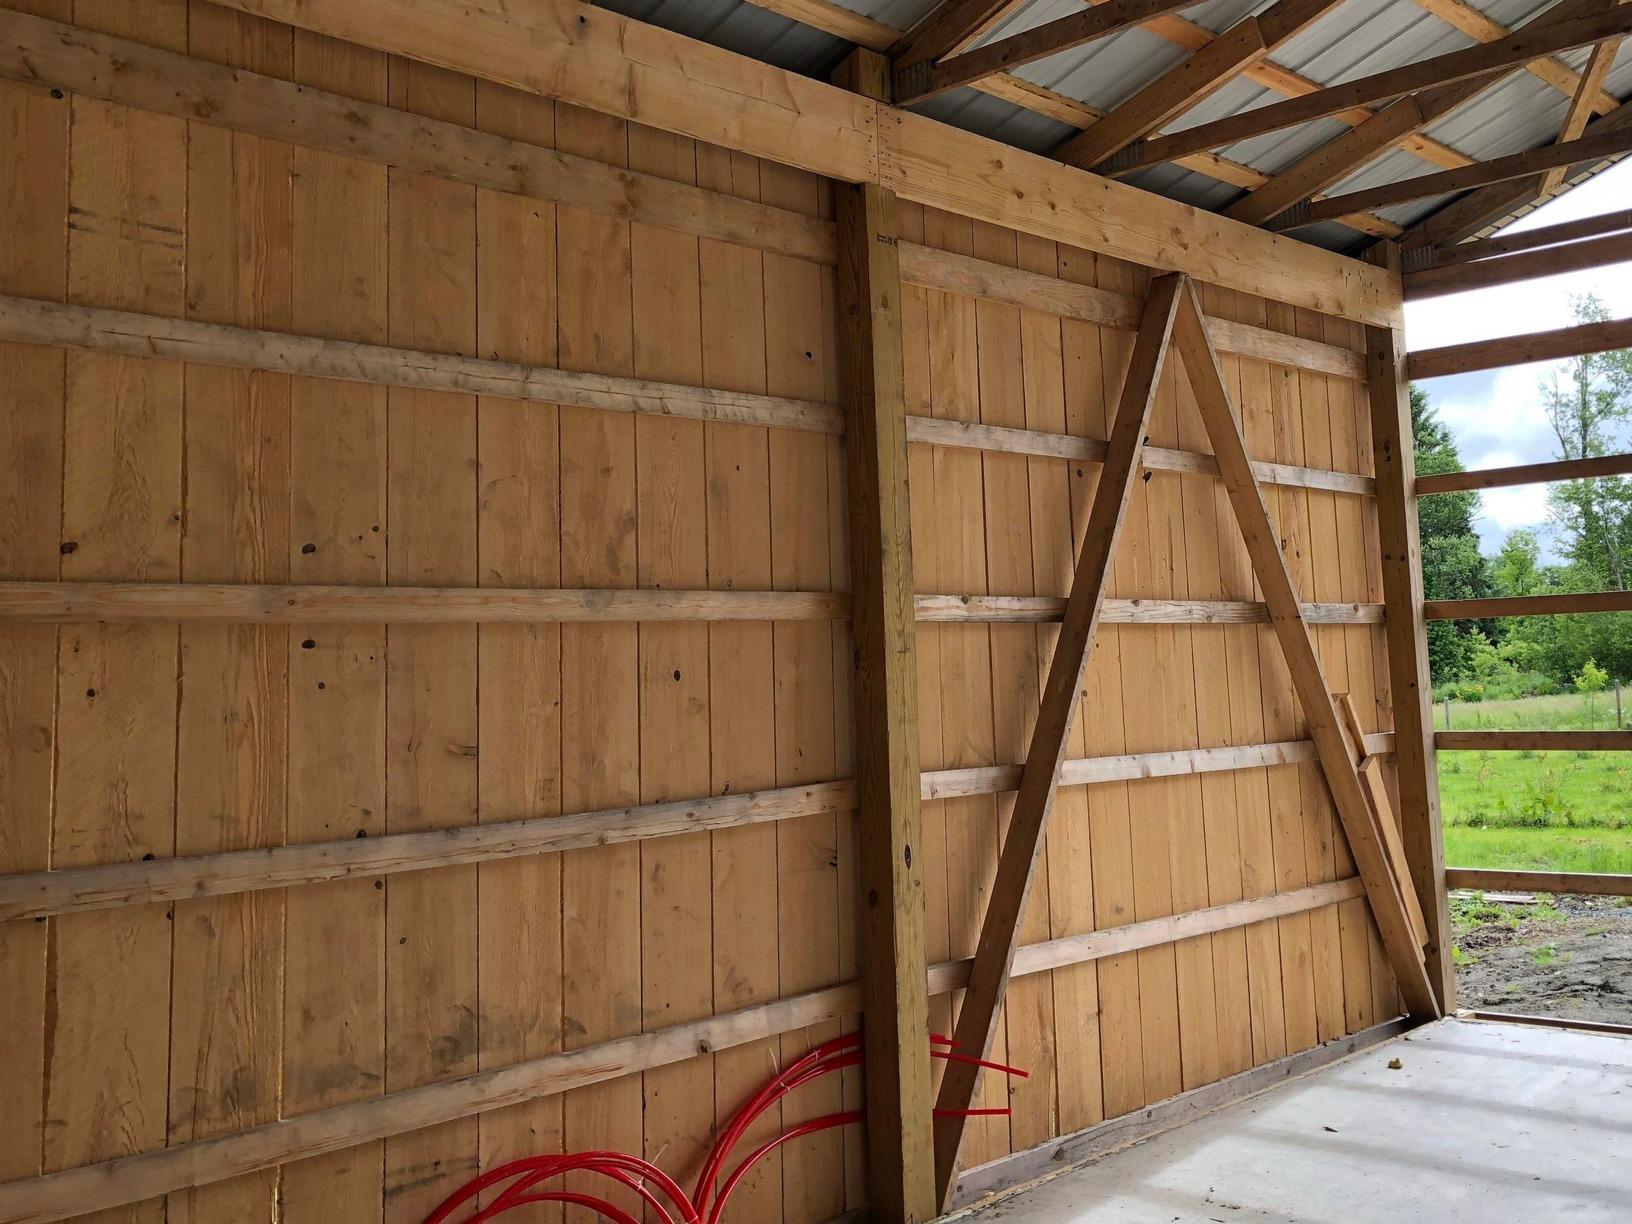 Pole Barn Insulation- Newfoundland Pa - Before Photo